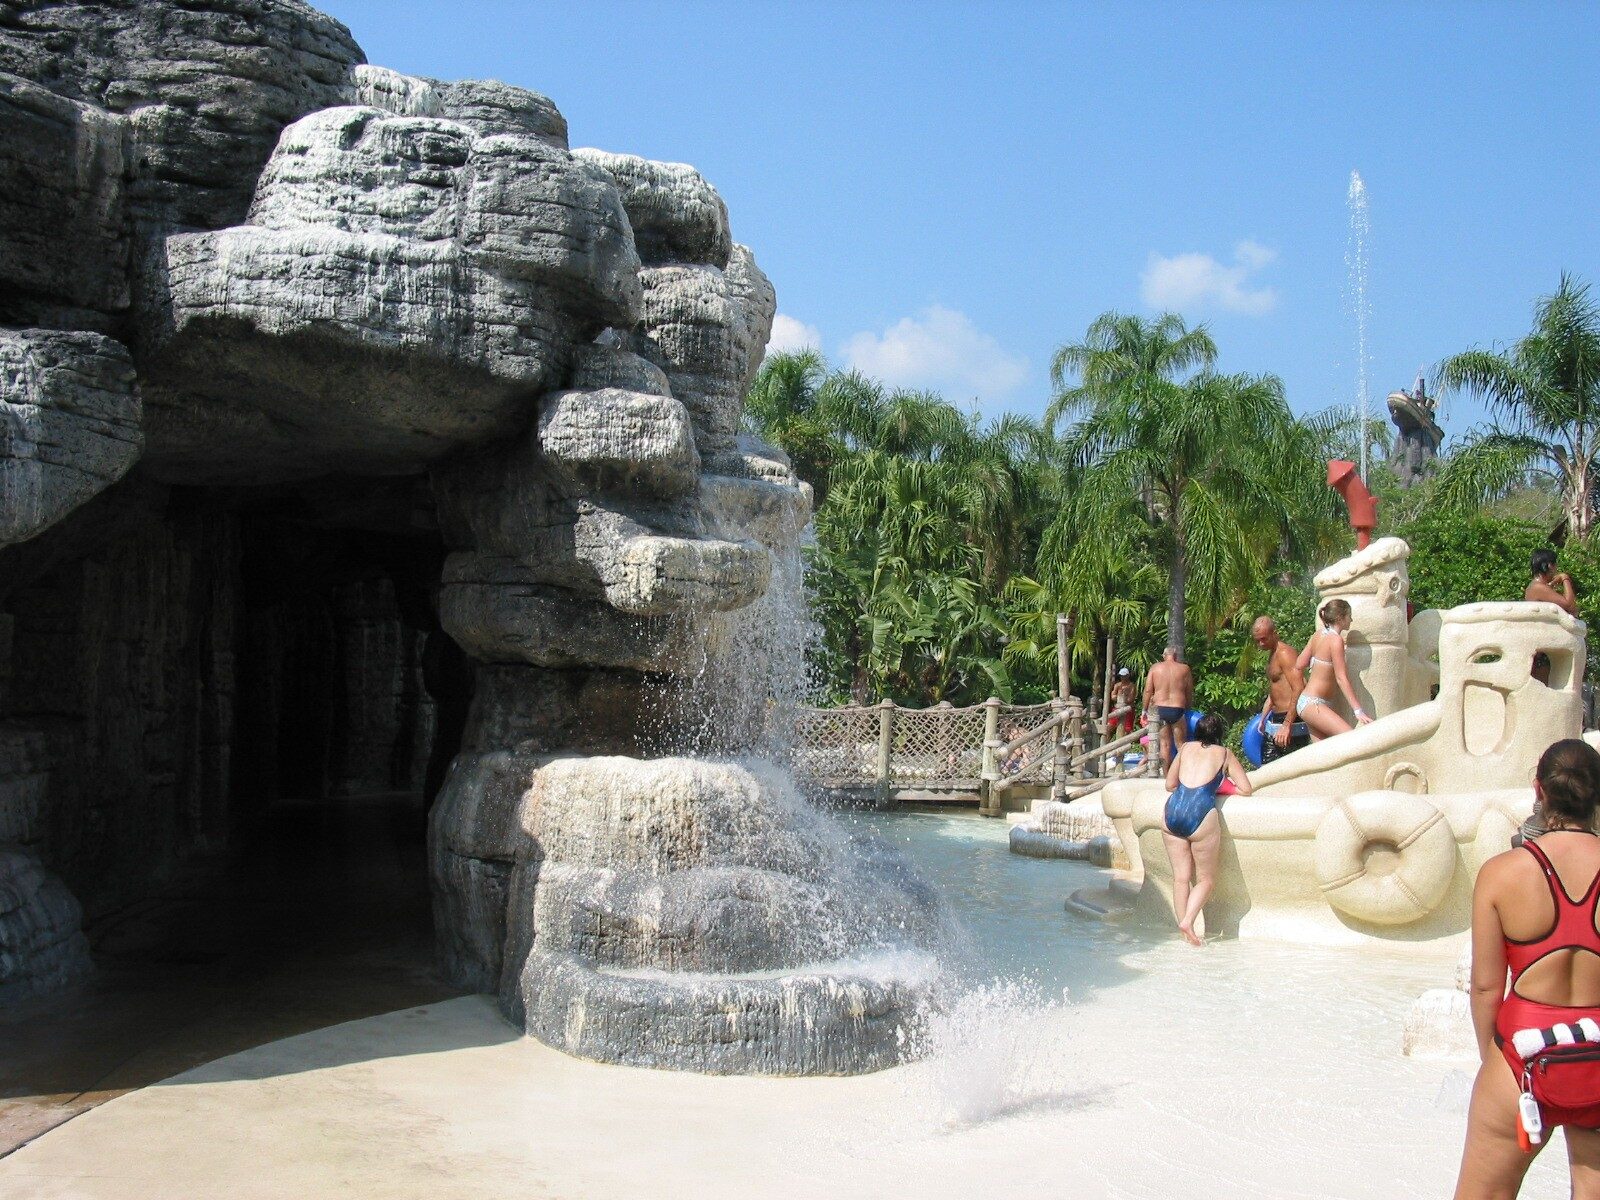 Orlando Water Parks Ketchakiddee Creek Cave